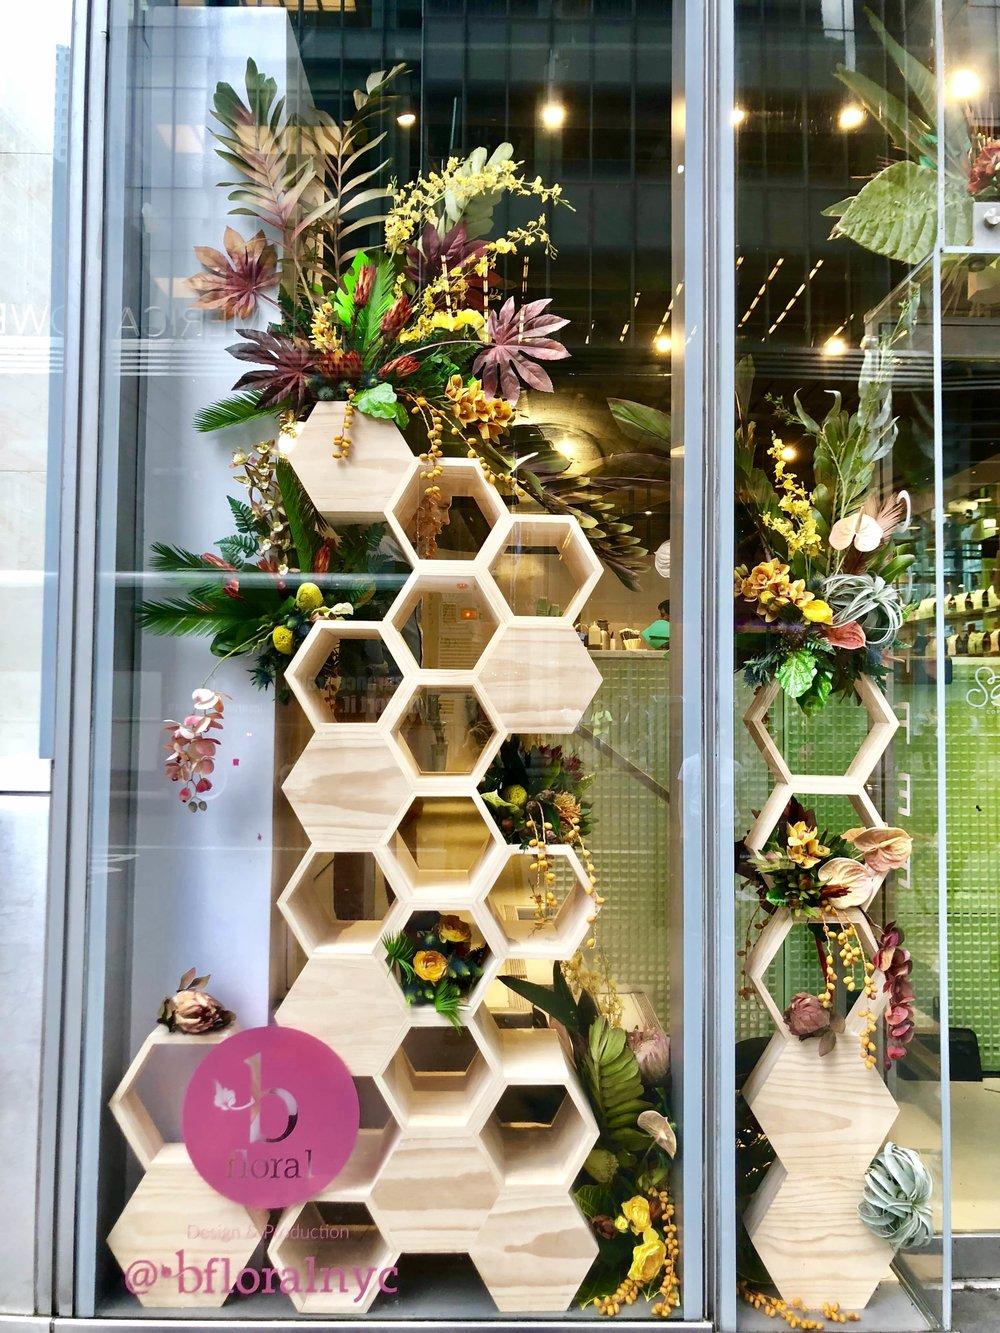 City of Saints Window Installation- B Floral